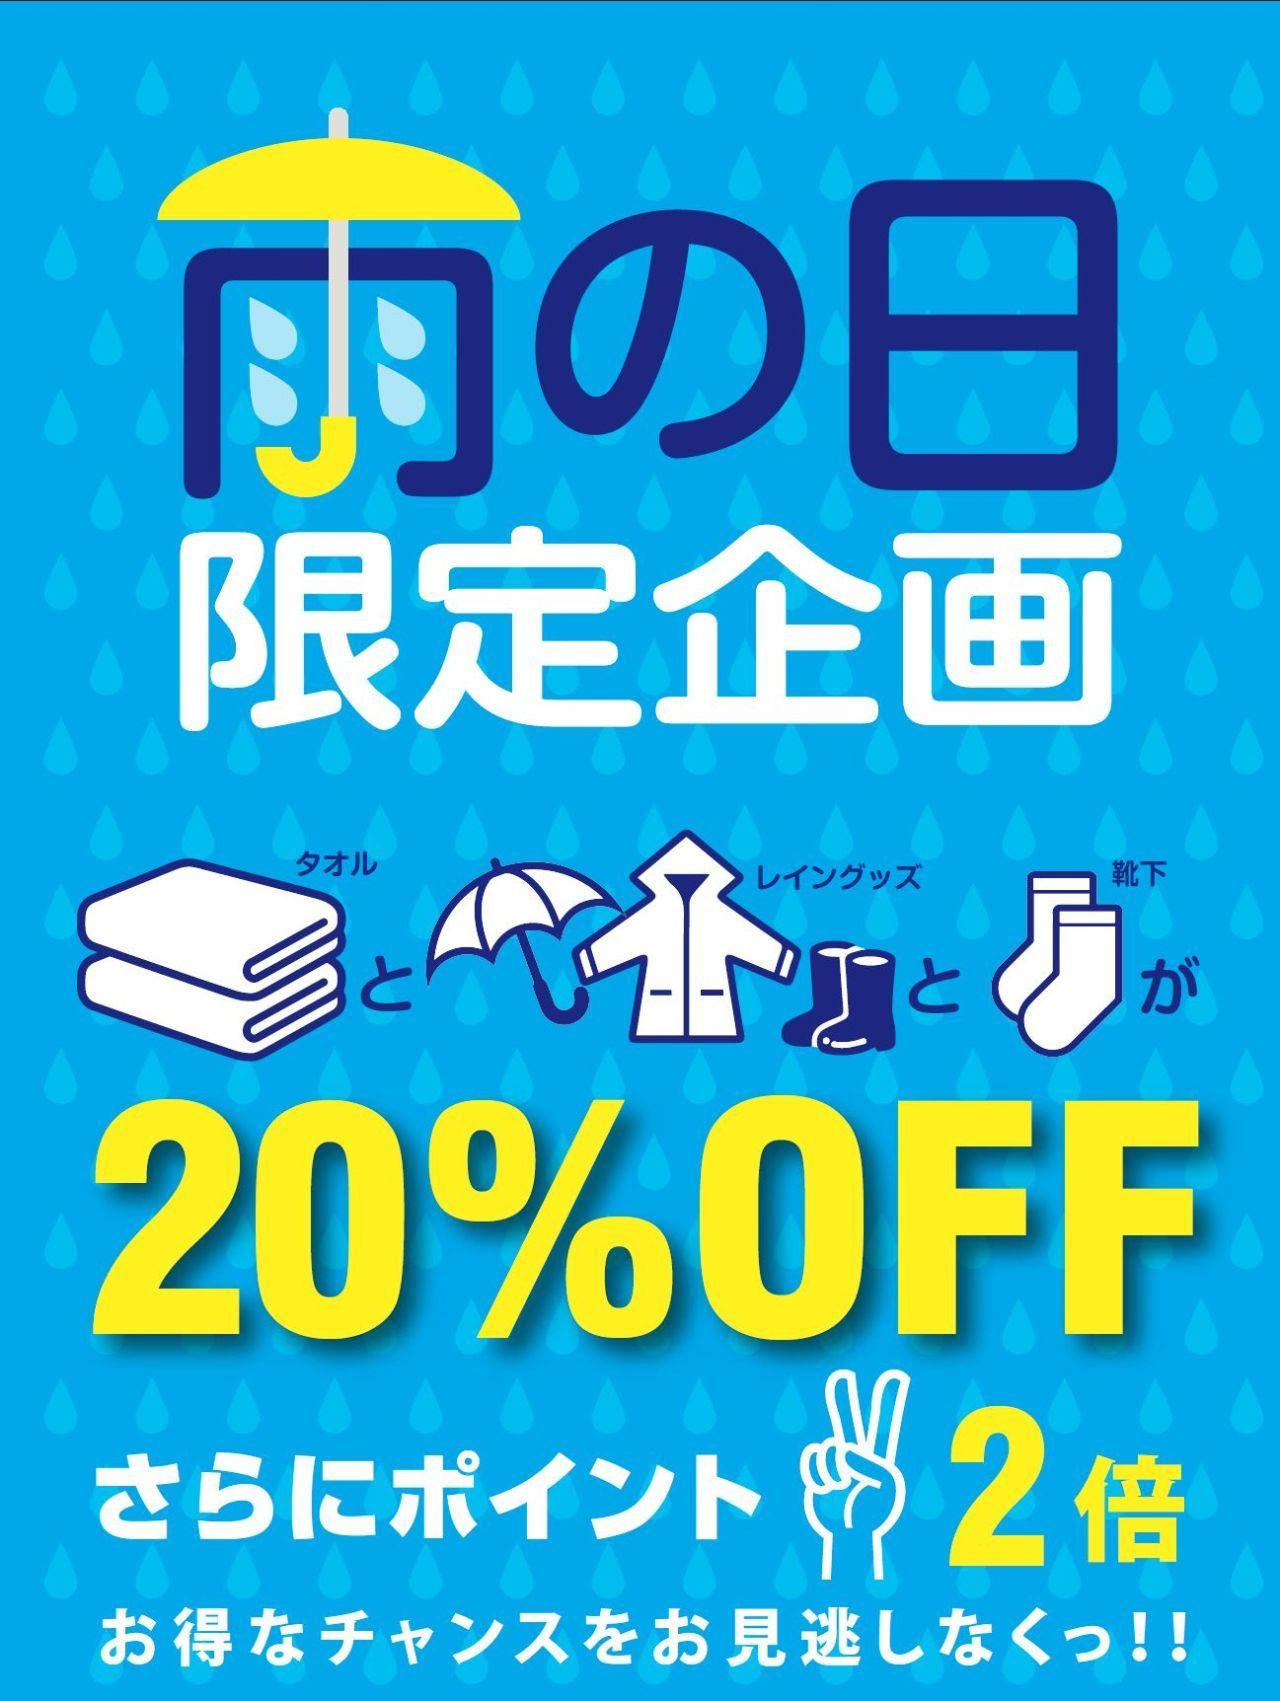 「【20%OFF】雨の日限定企画【タオル・レイングッズ・靴下】」の写真